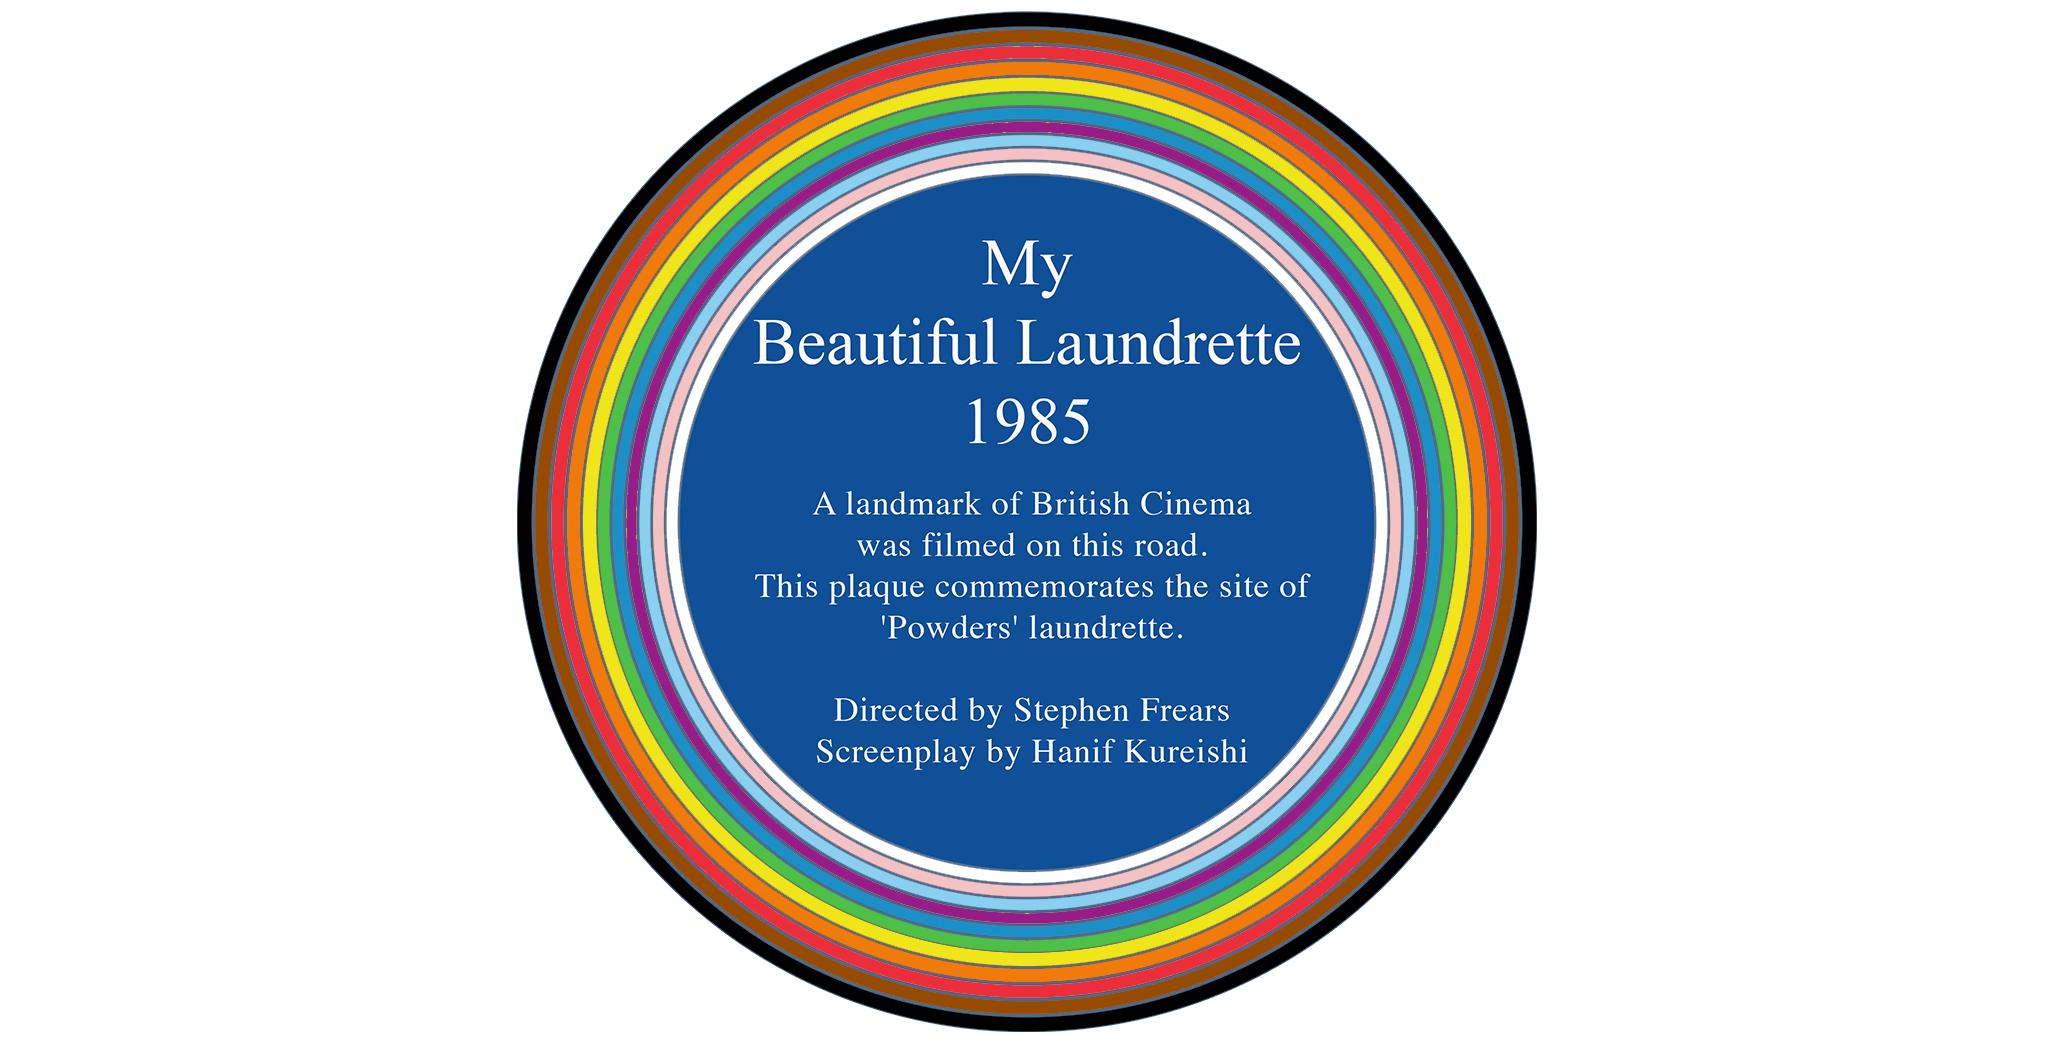 Vauxhall: New Rainbow Plaque dedicated to film, My Beautiful Laundrette